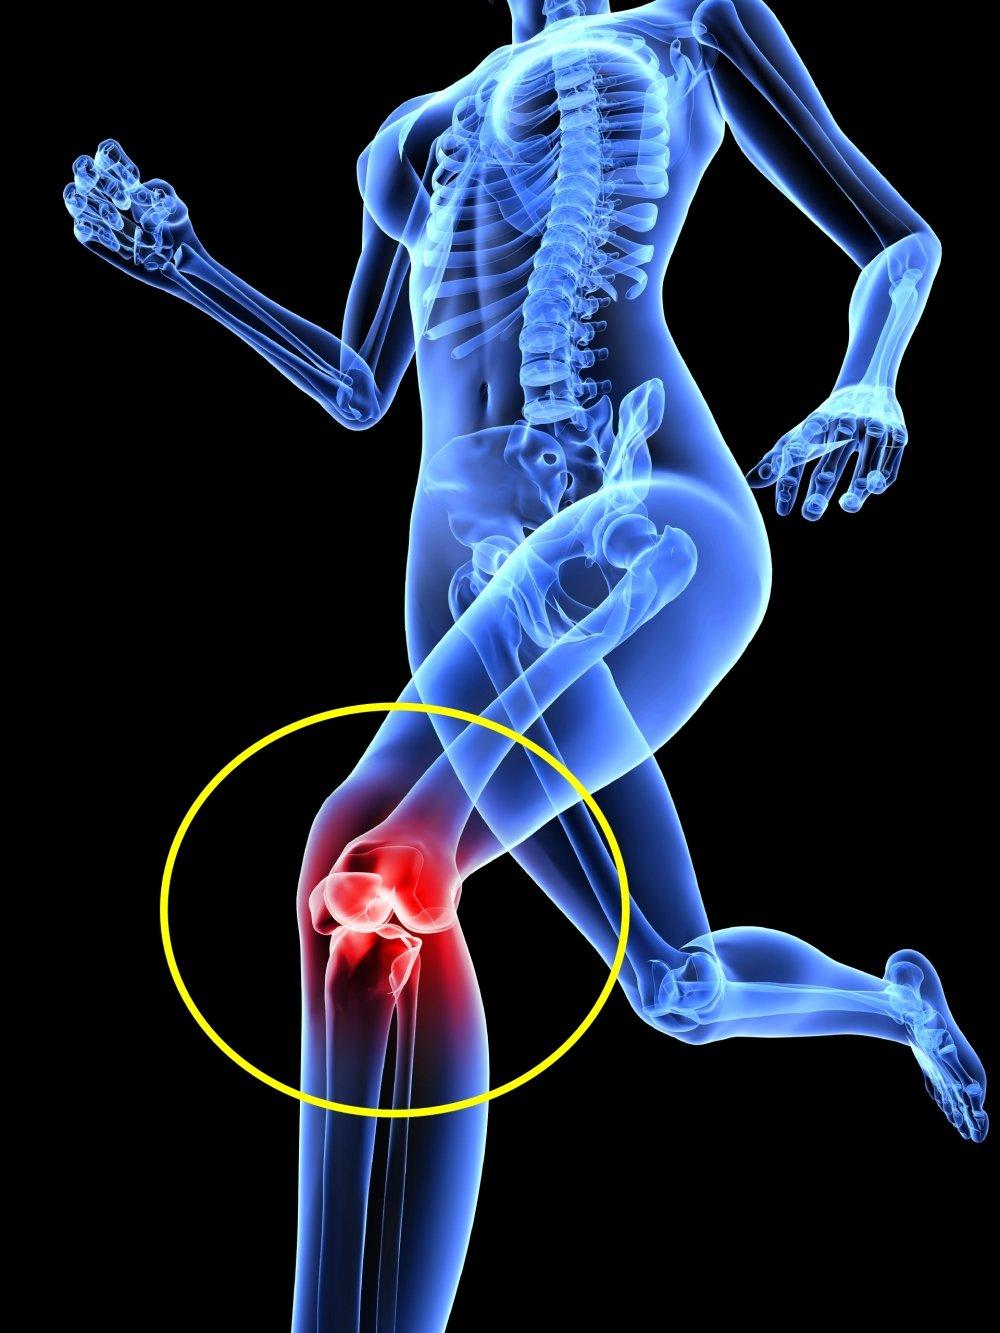 Amazon neobracex patella tendon strap knee pain relief amazon neobracex patella tendon strap knee pain relief patella stabilizer for jumpers knee running tennis osgood schlatter tendonitis ccuart Images